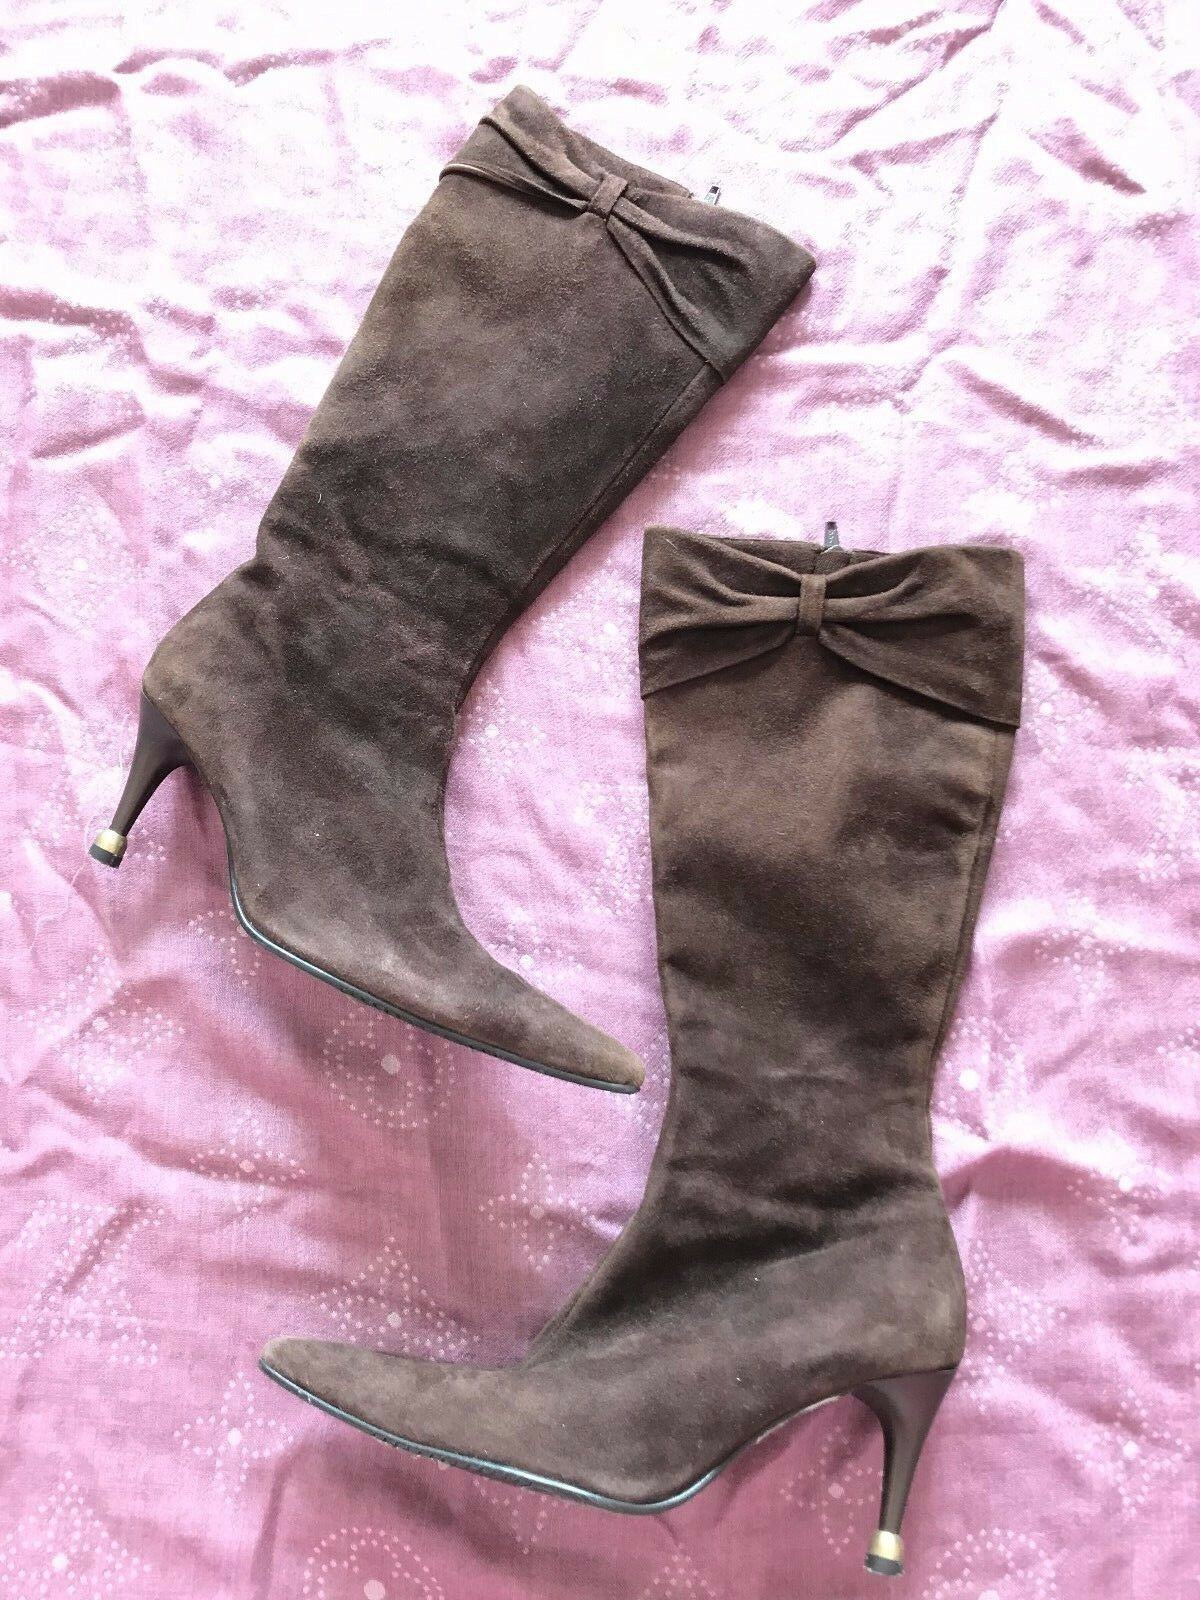 Australia VAGO Premium SUEDE Pelle Knee-High BOW Zip BOOTS w/INSOLIA shoe heel